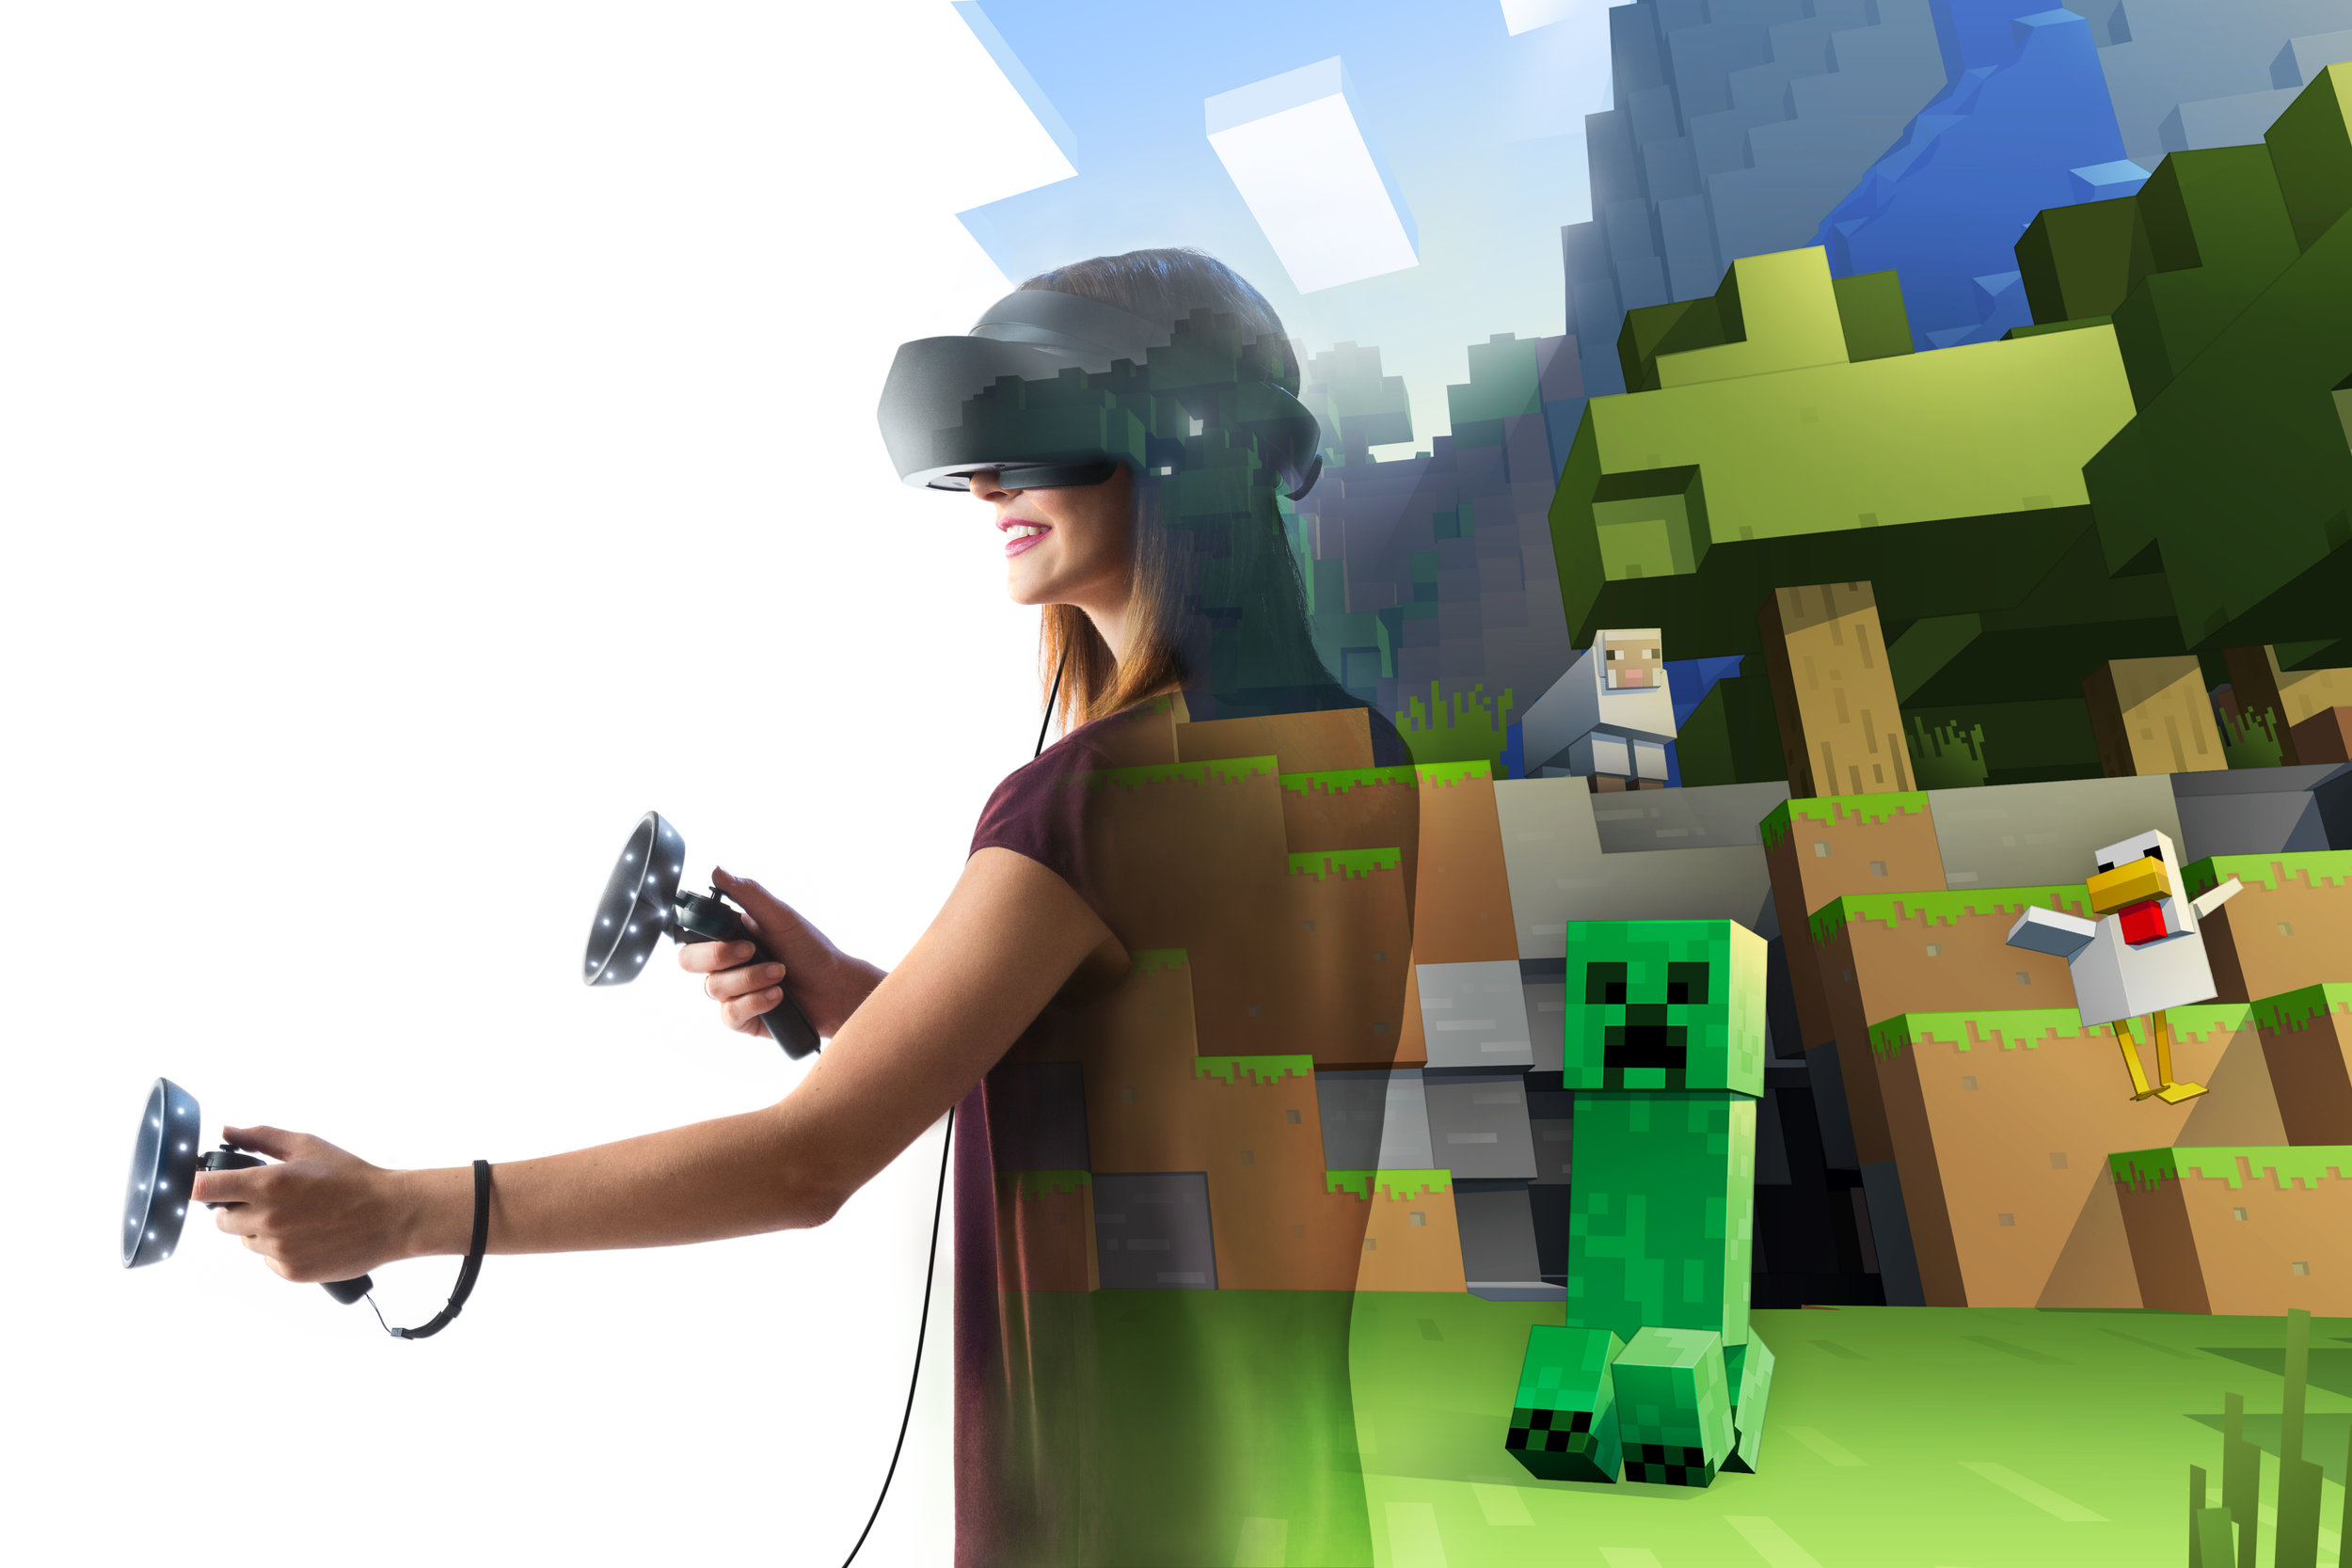 WinMR_Minecraft_2039_RGB.jpg